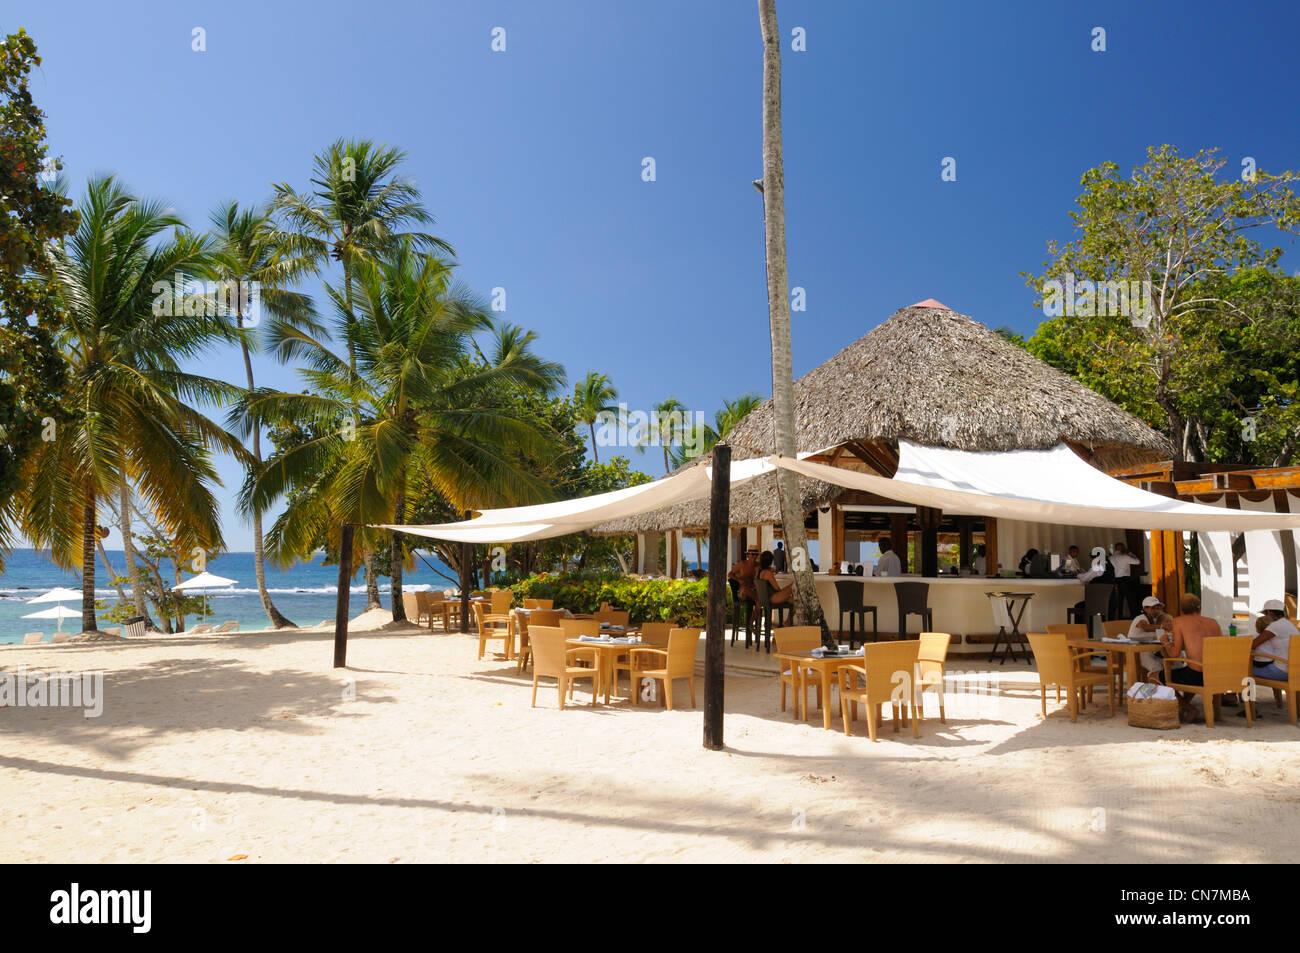 Dominican republic la romana province casa de campo bar - Casa de campo park ...